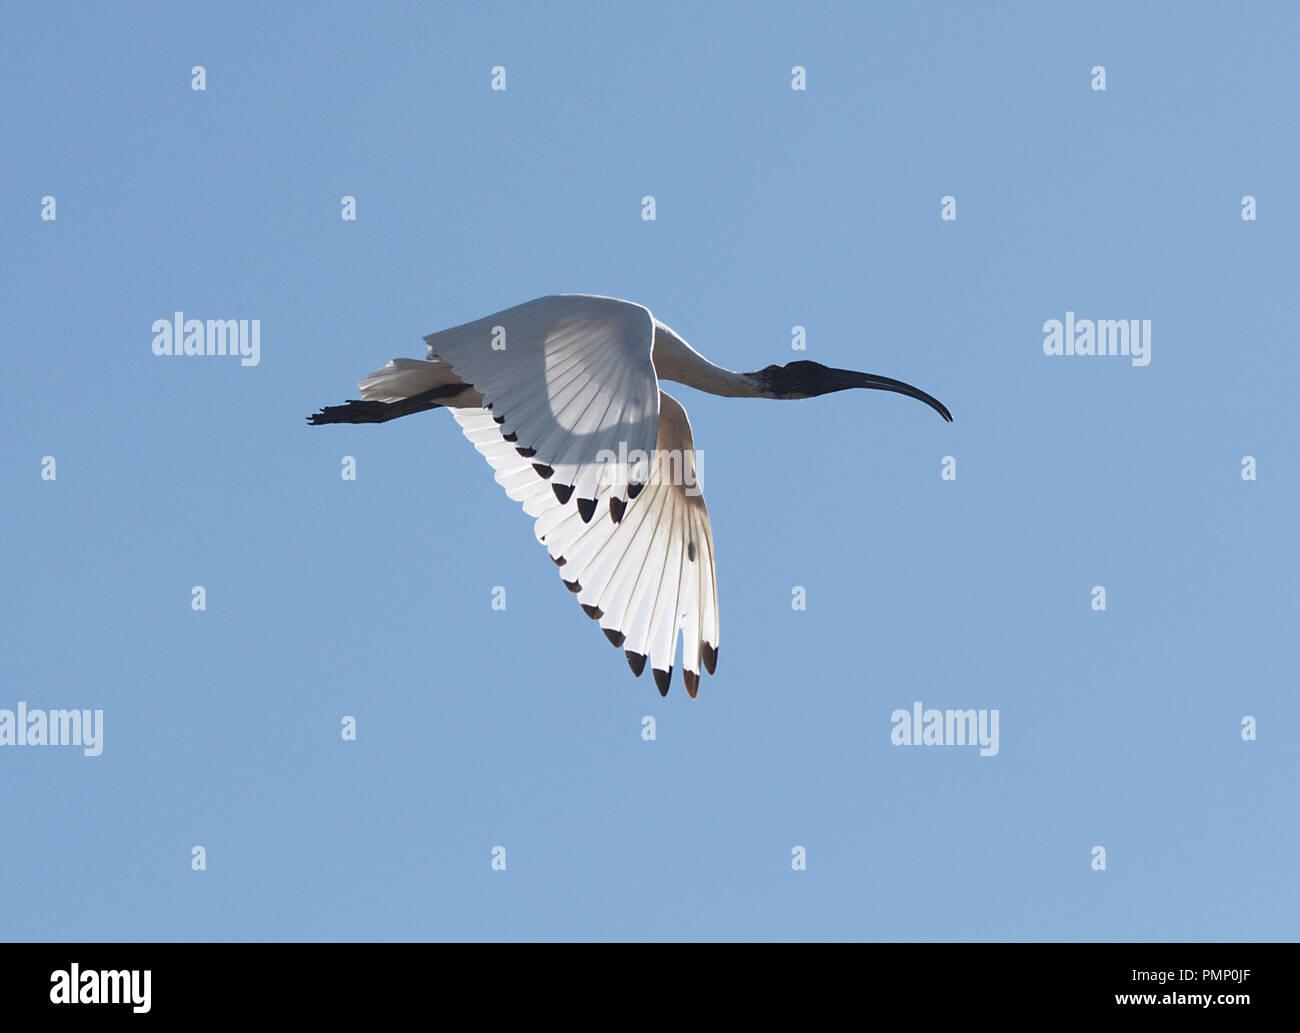 Australian White Ibis (Threskiornis molucca) in flight flapping wings, Emu Creek, near Petford, North Queensland, QLD, Australia - Stock Image